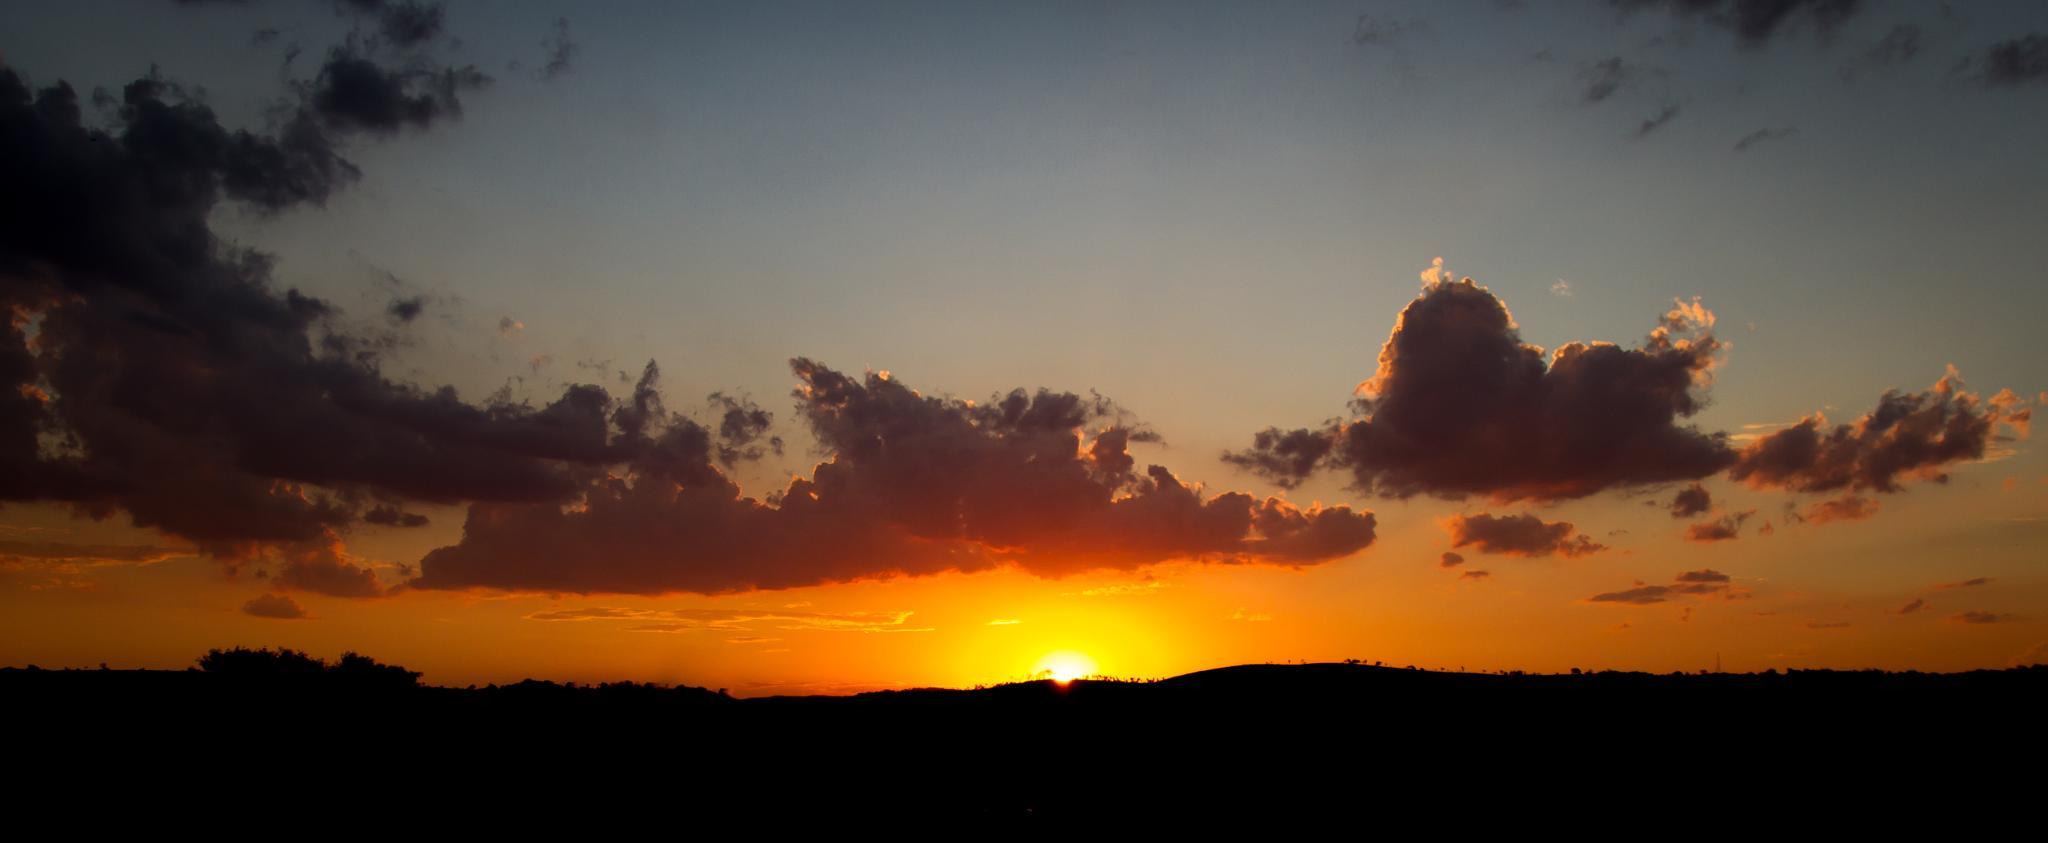 Sun by Alexandre Souza